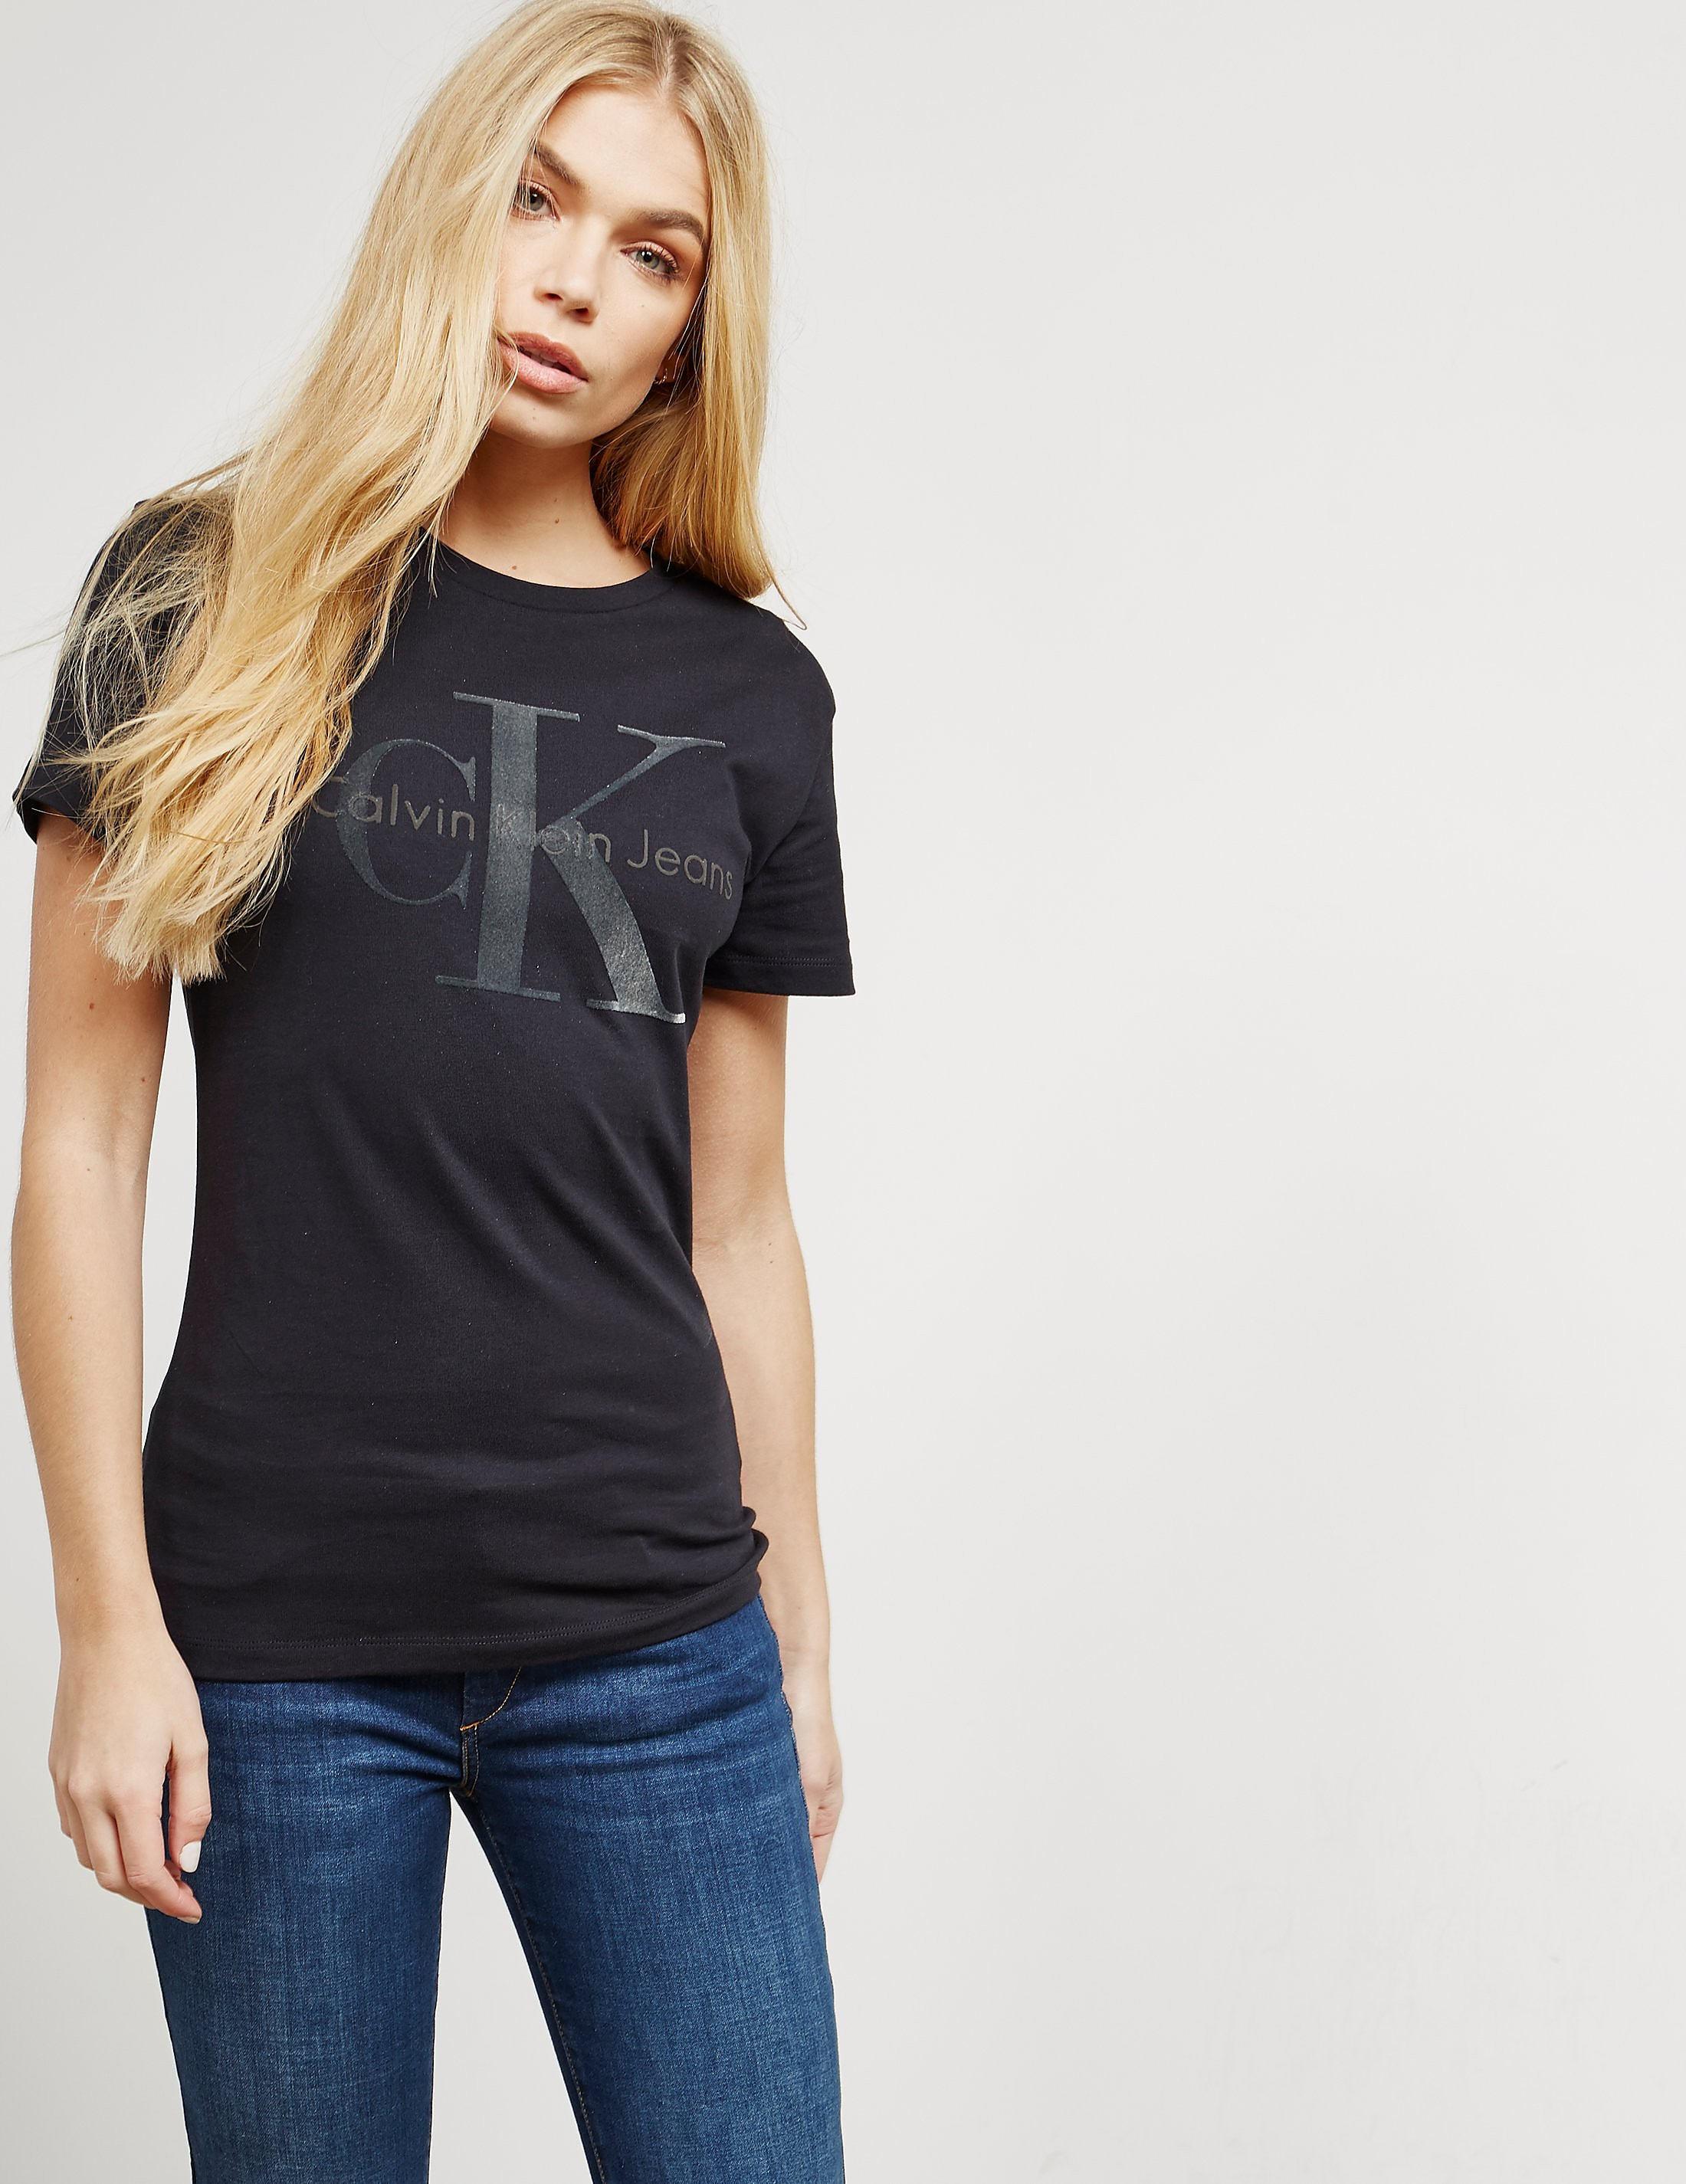 Calvin Klein Tanya-38 Short Sleeve T-Shirt